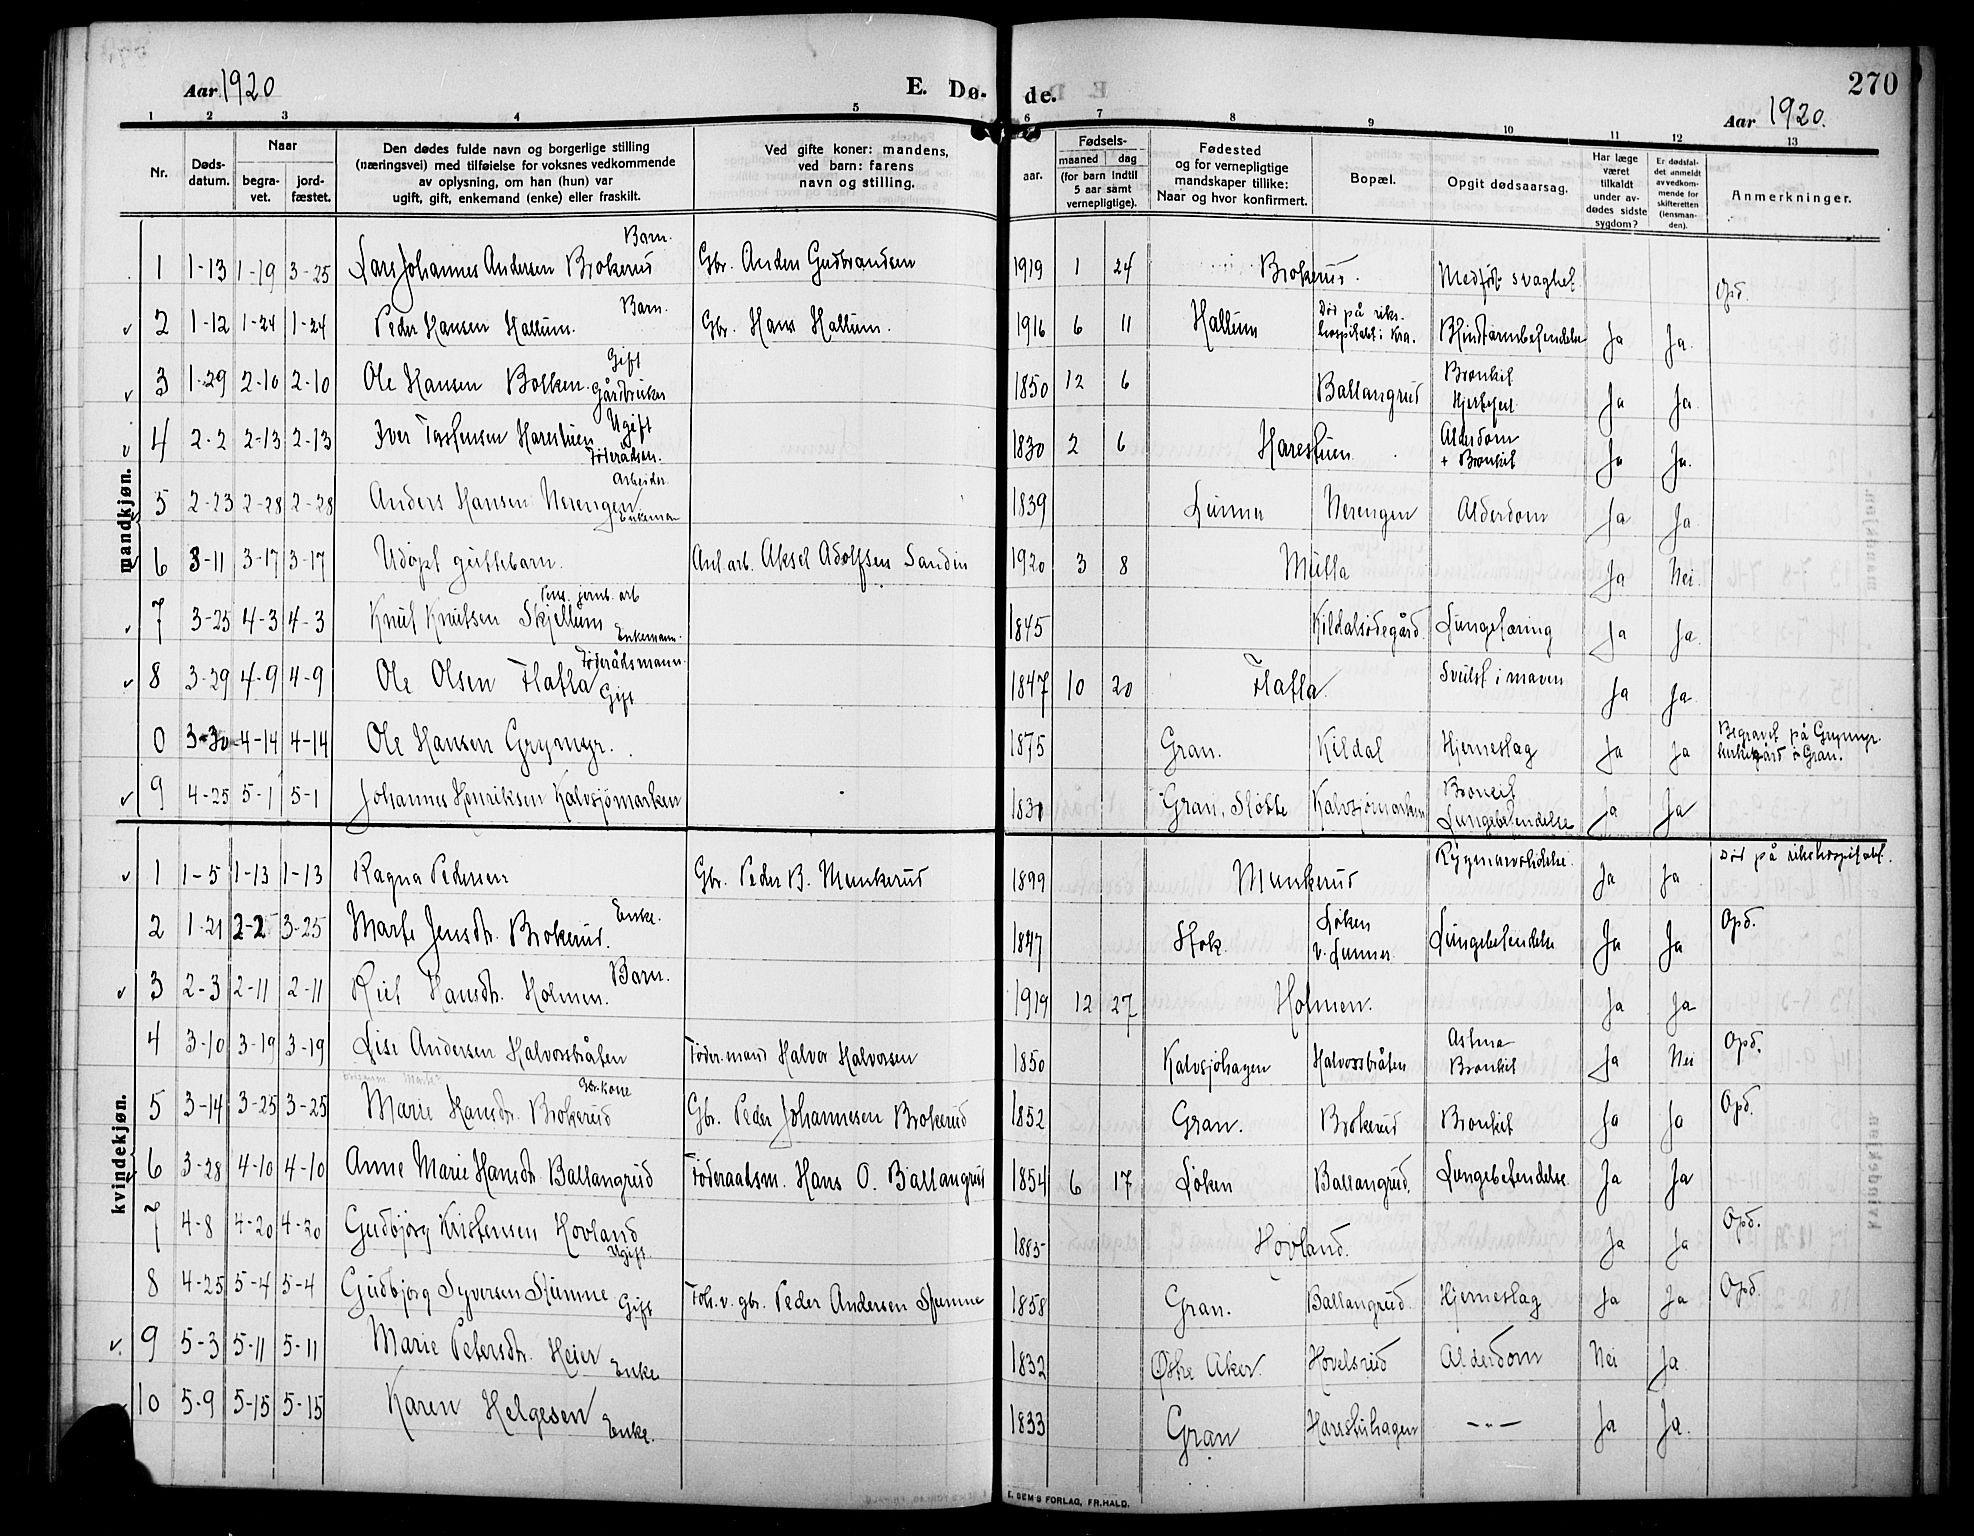 SAH, Lunner prestekontor, H/Ha/Hab/L0001: Klokkerbok nr. 1, 1909-1922, s. 270